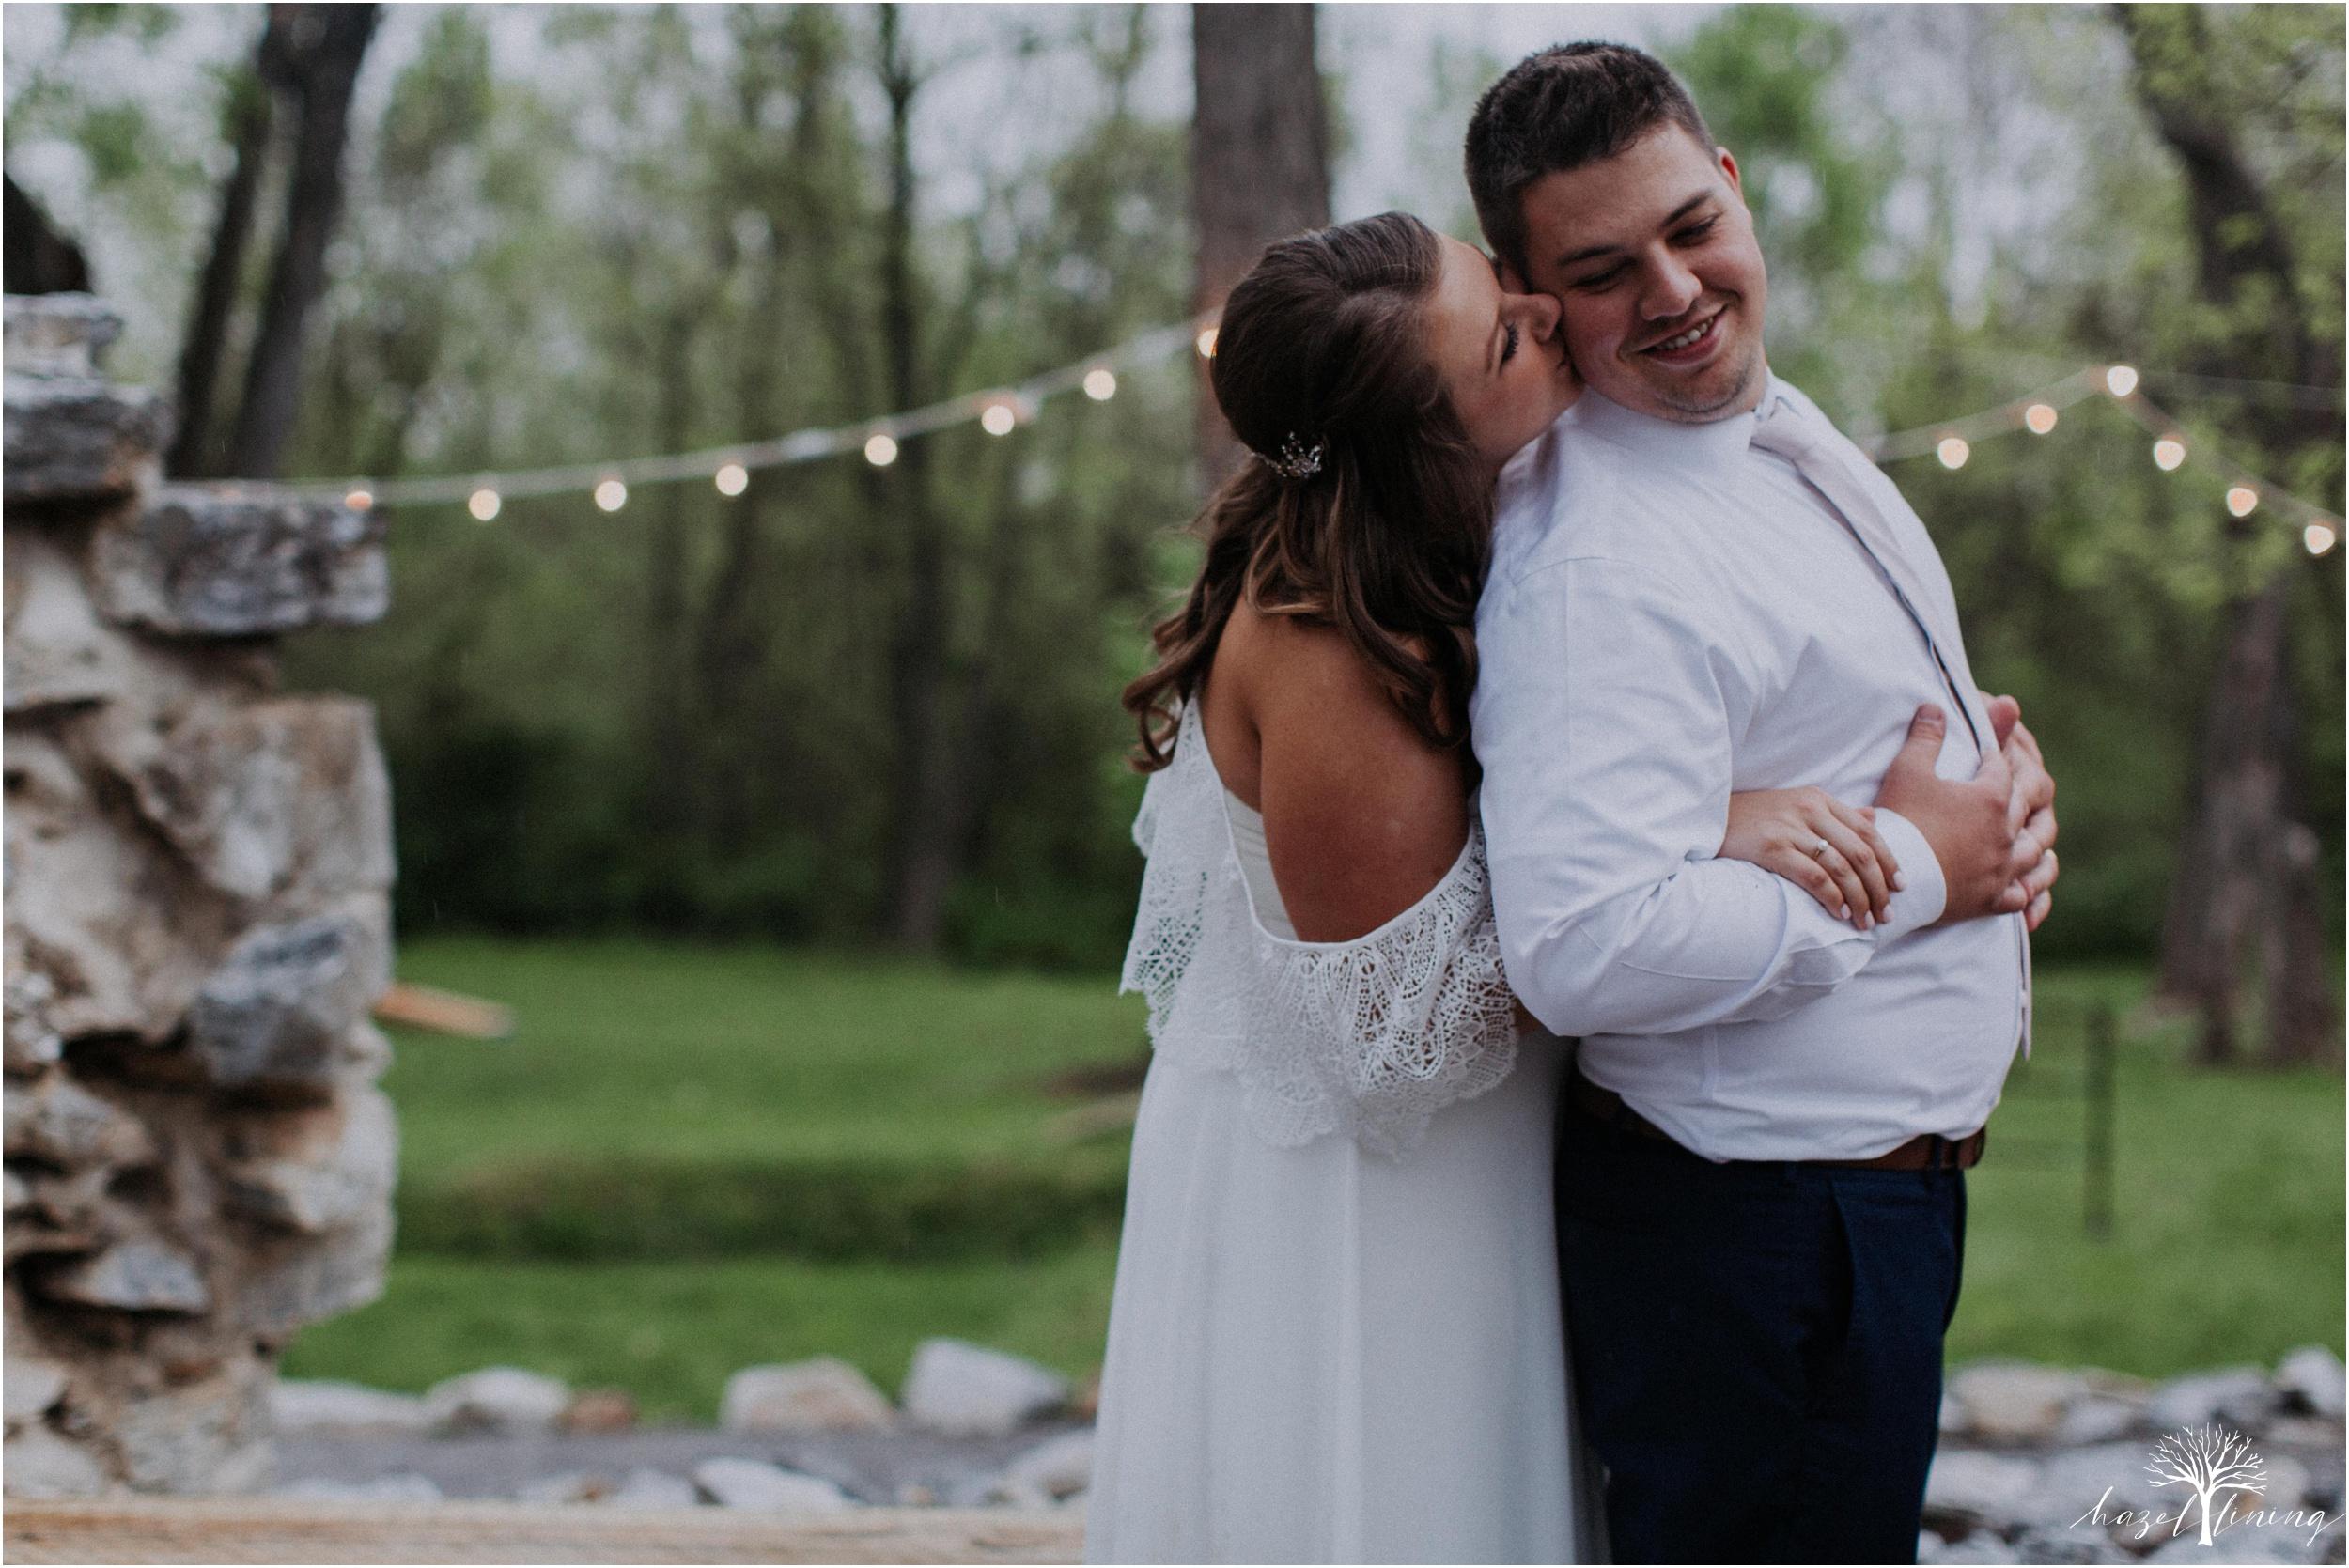 hazel-lining-travel-wedding-elopement-photography-abby-skyler-hunt-the-willis-house-york-pennsylvania-outdoor-estate-wedding_0131.jpg